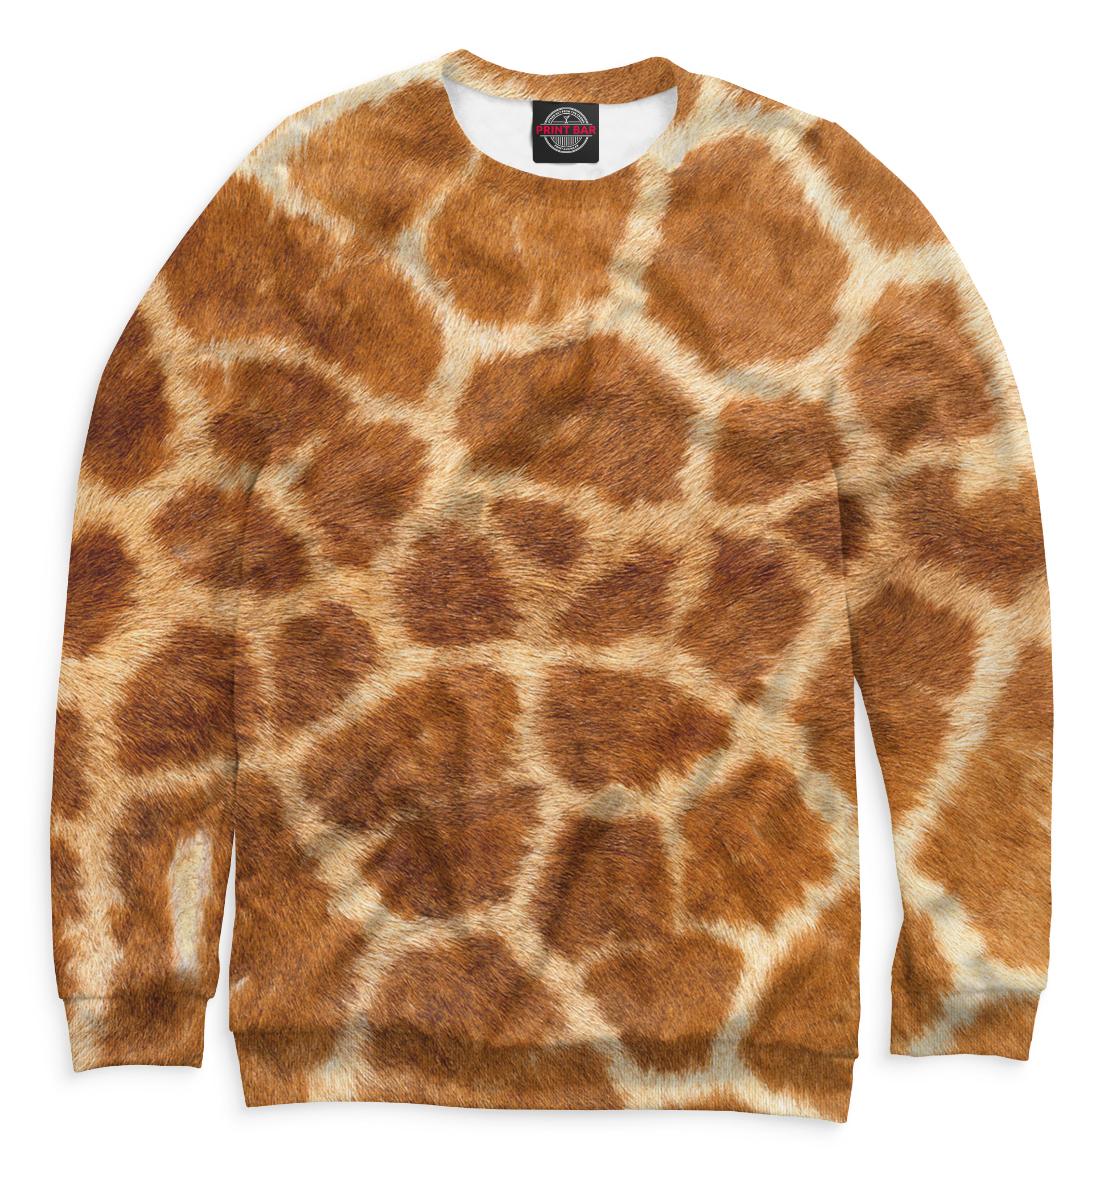 Купить Жираф, Printbar, Свитшоты, OKR-966004-swi-1